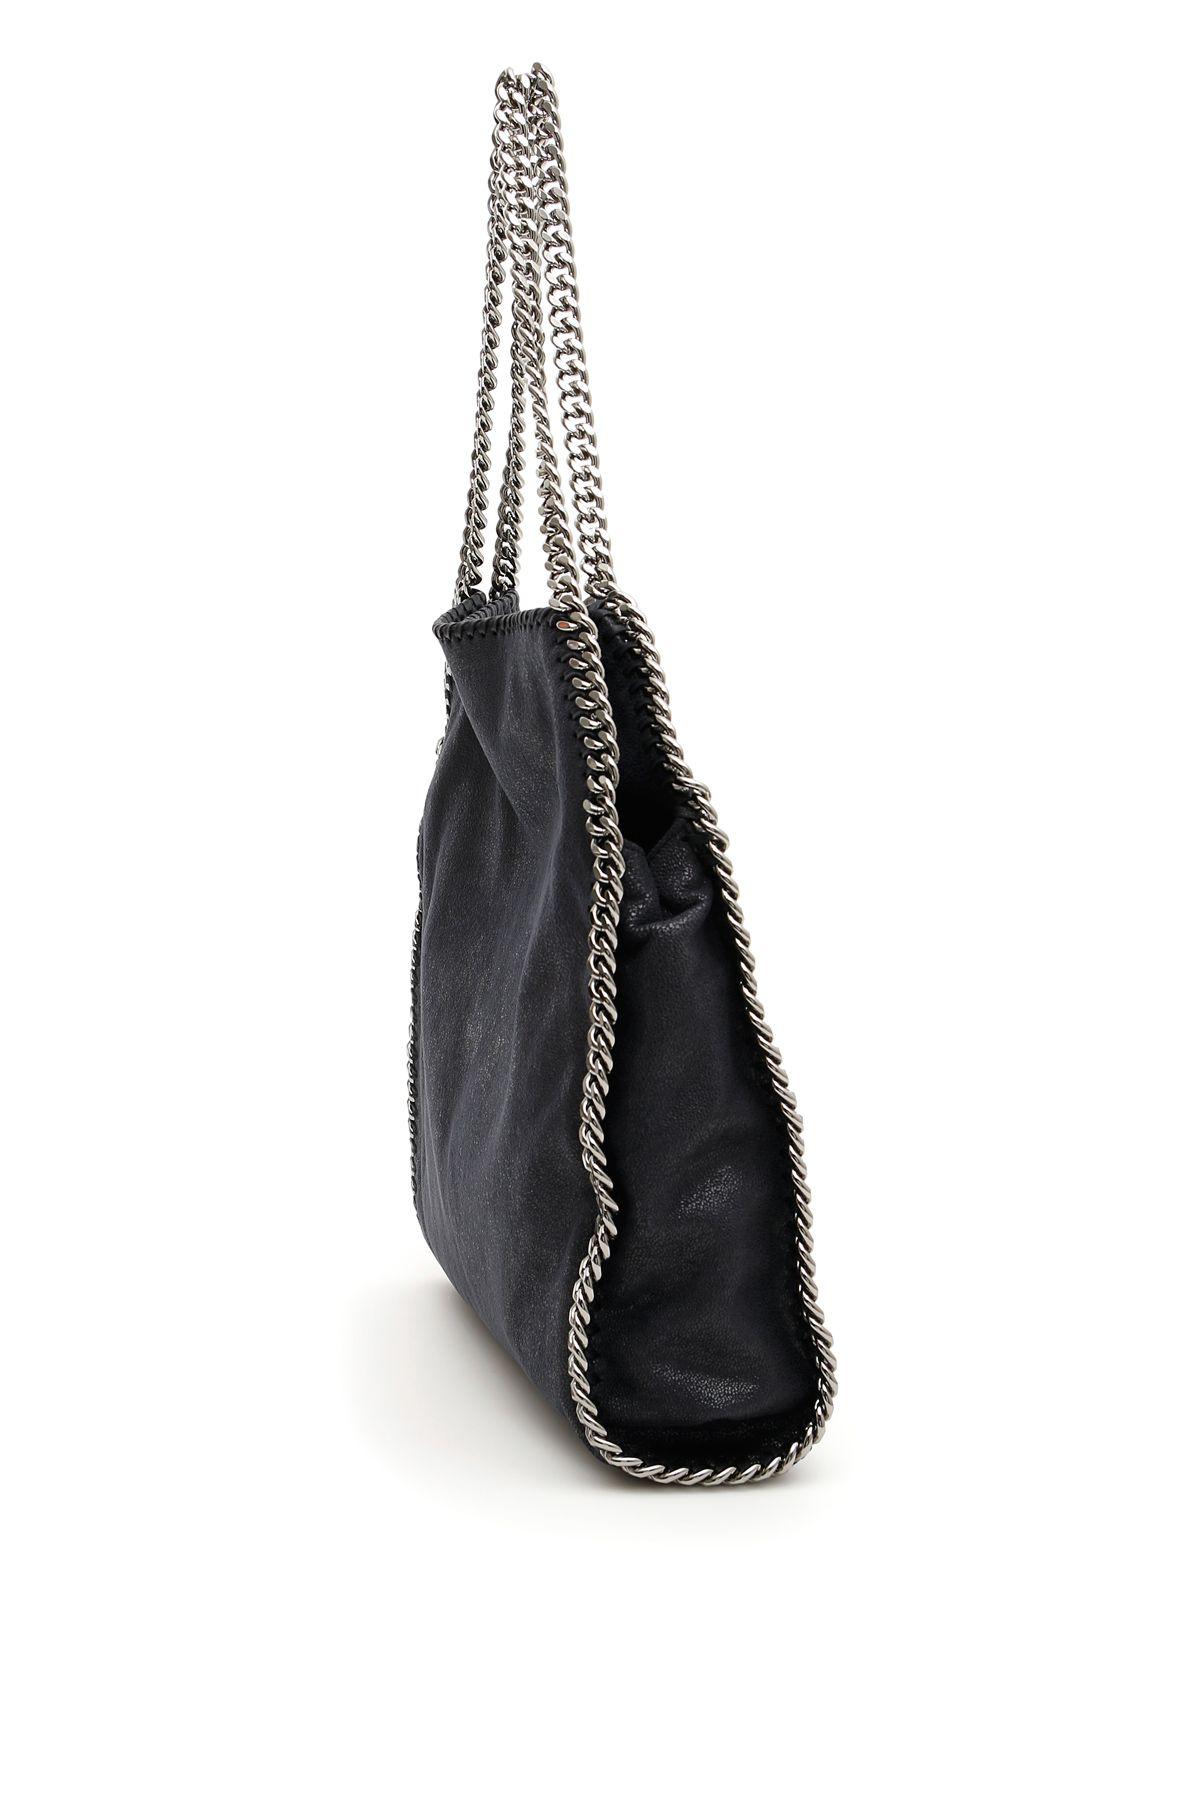 8b169b4a583ea ... Stella McCartney Small Falabella Tote Bag - NAVY